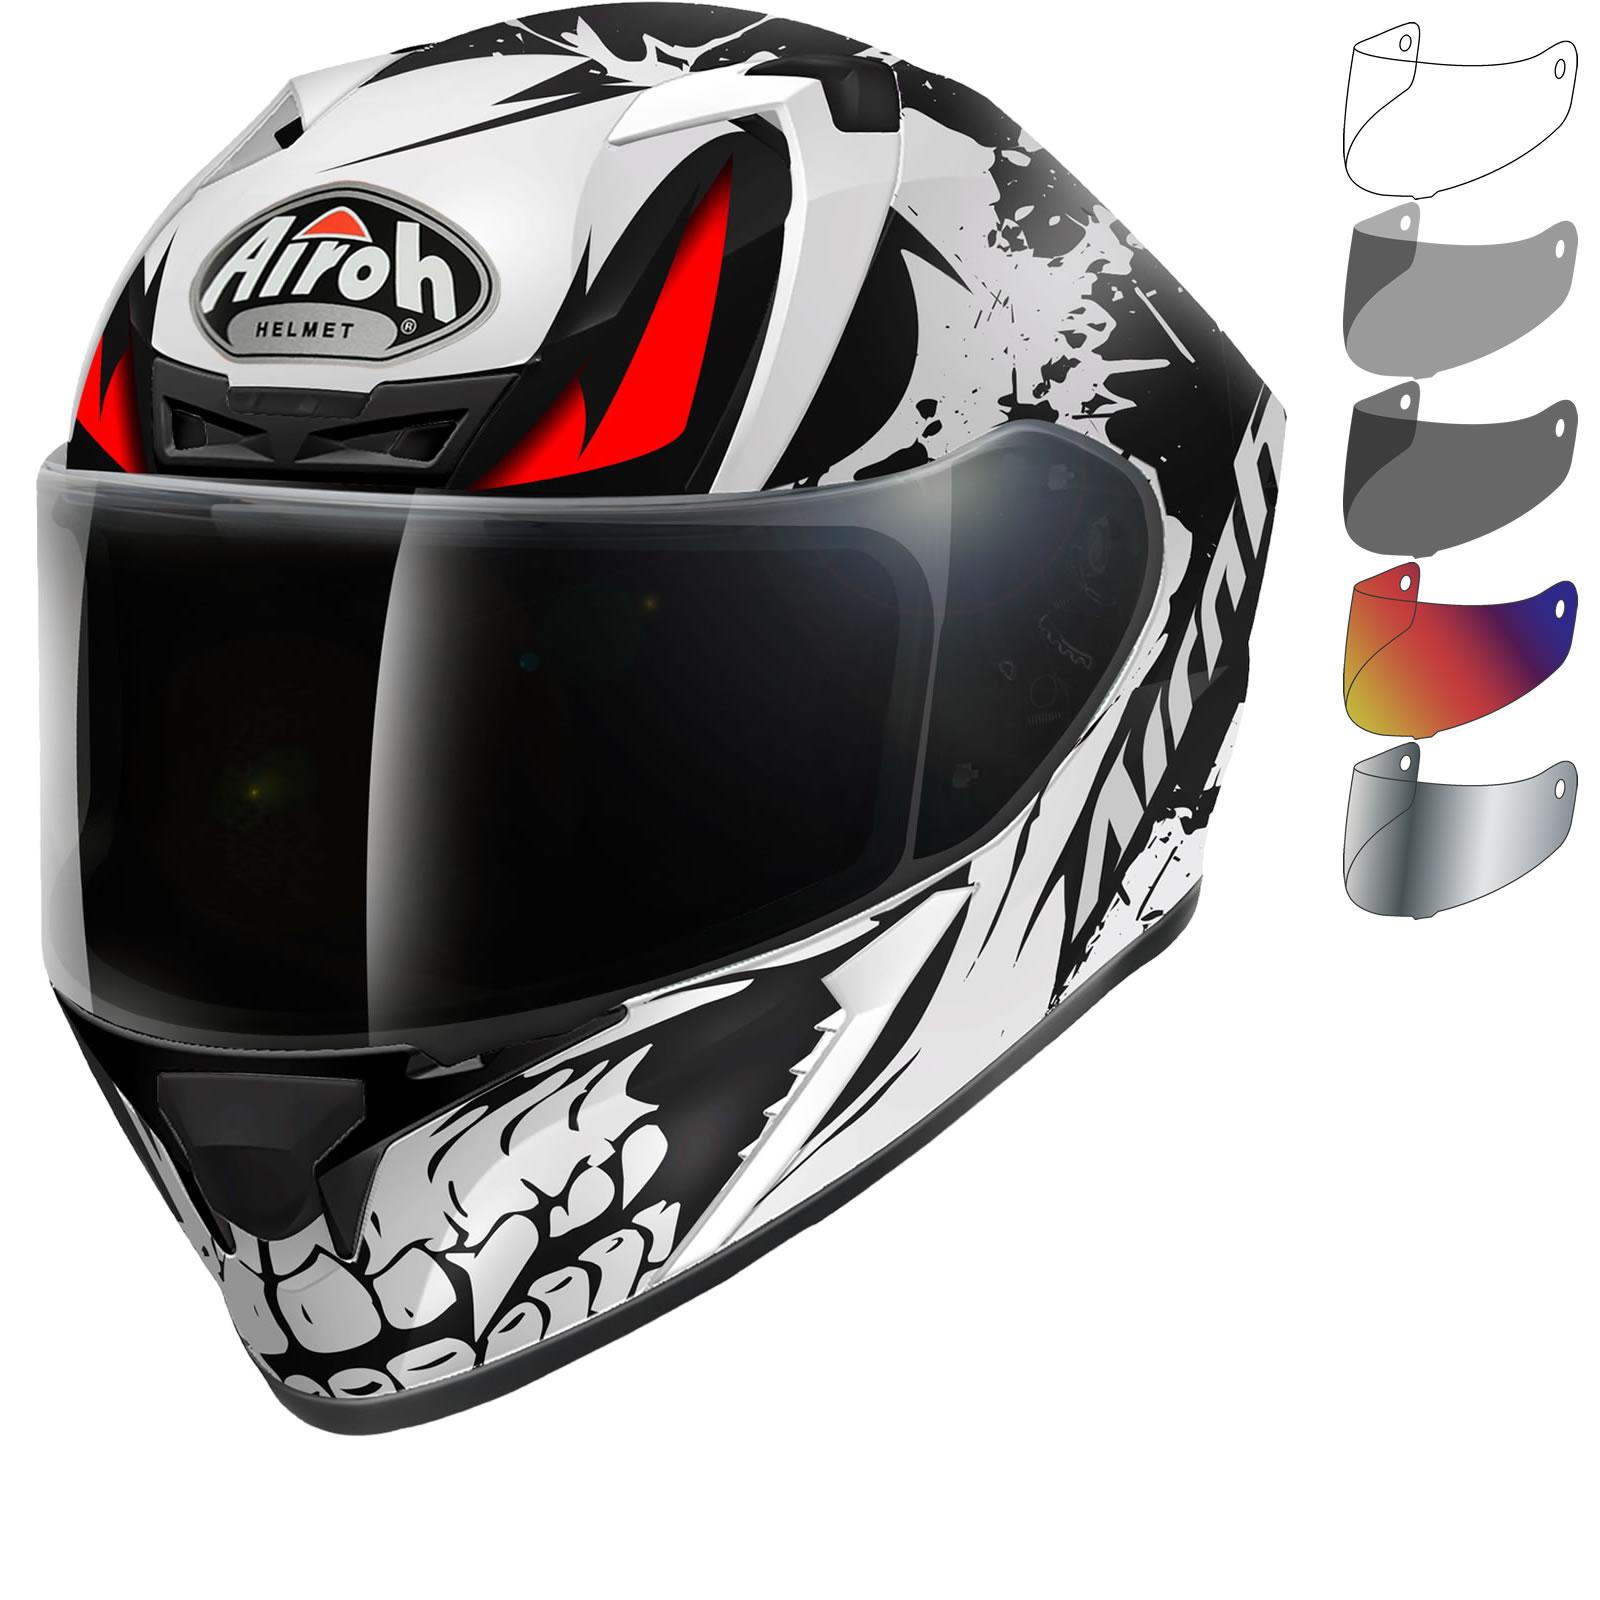 c944dd5073158 Airoh Valor Bone Motorcycle Helmet   Visor Full Face Pinlock Ready ...